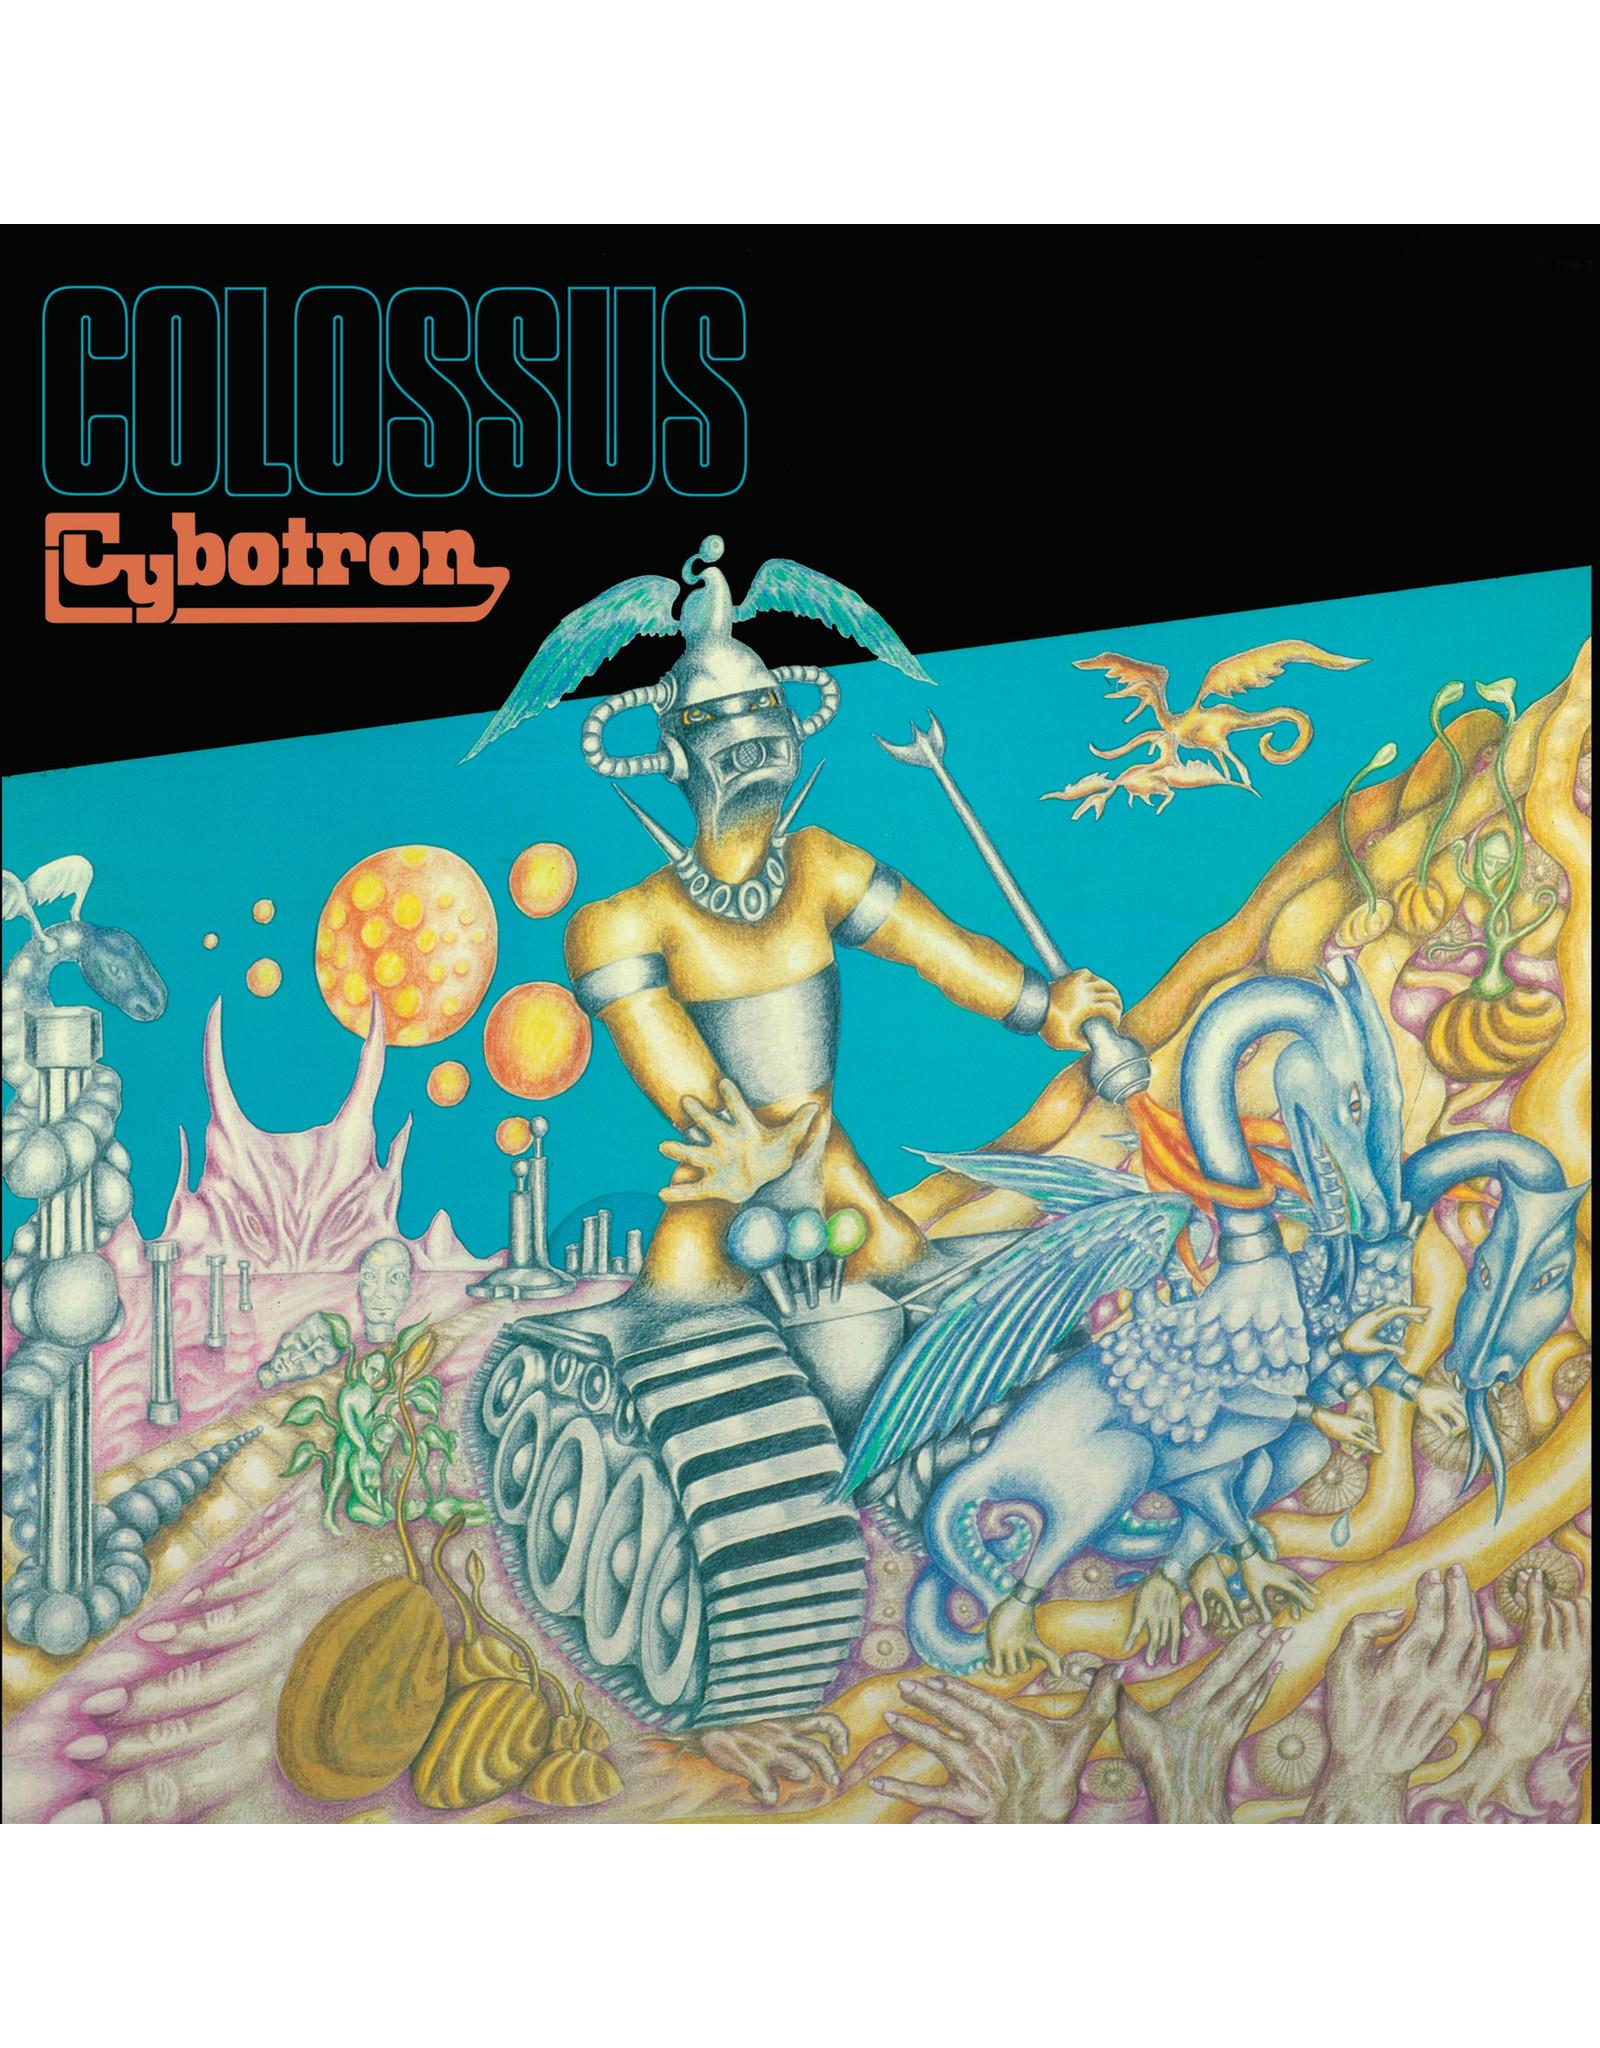 Cybotron - Colossus LP